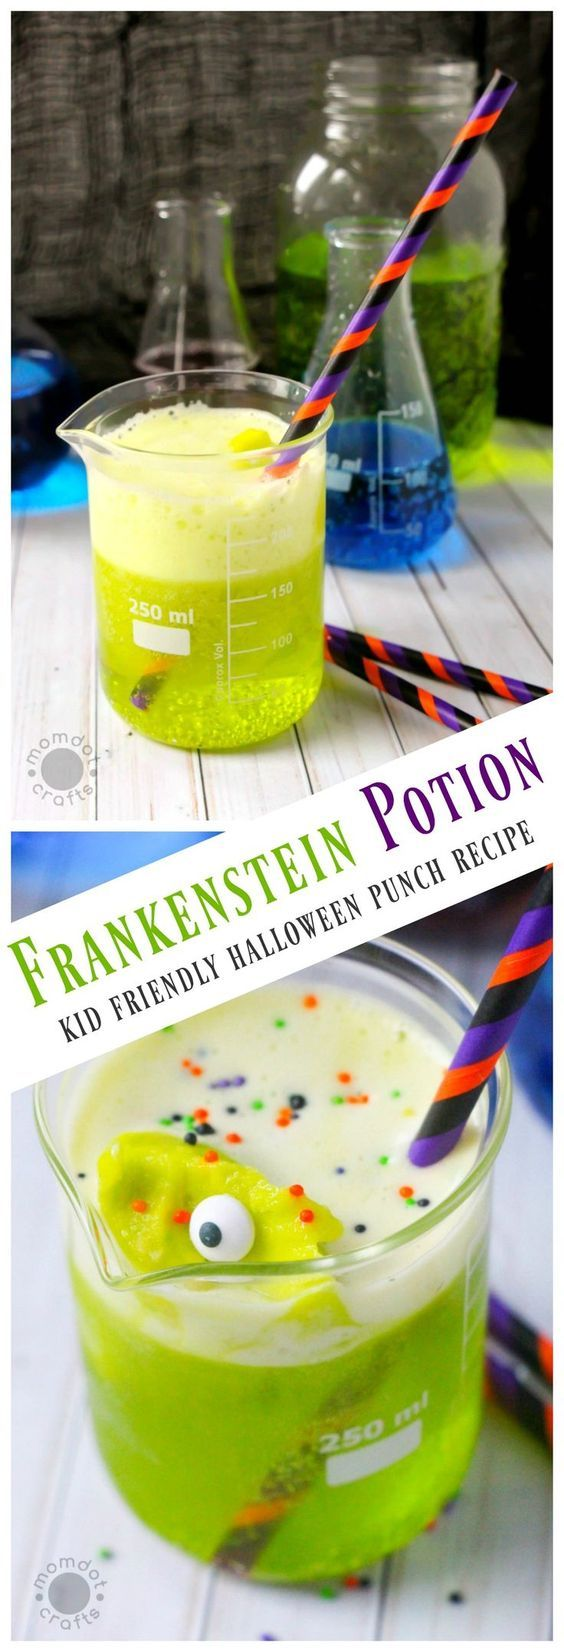 17 Fun Ideas for Halloween Drinks